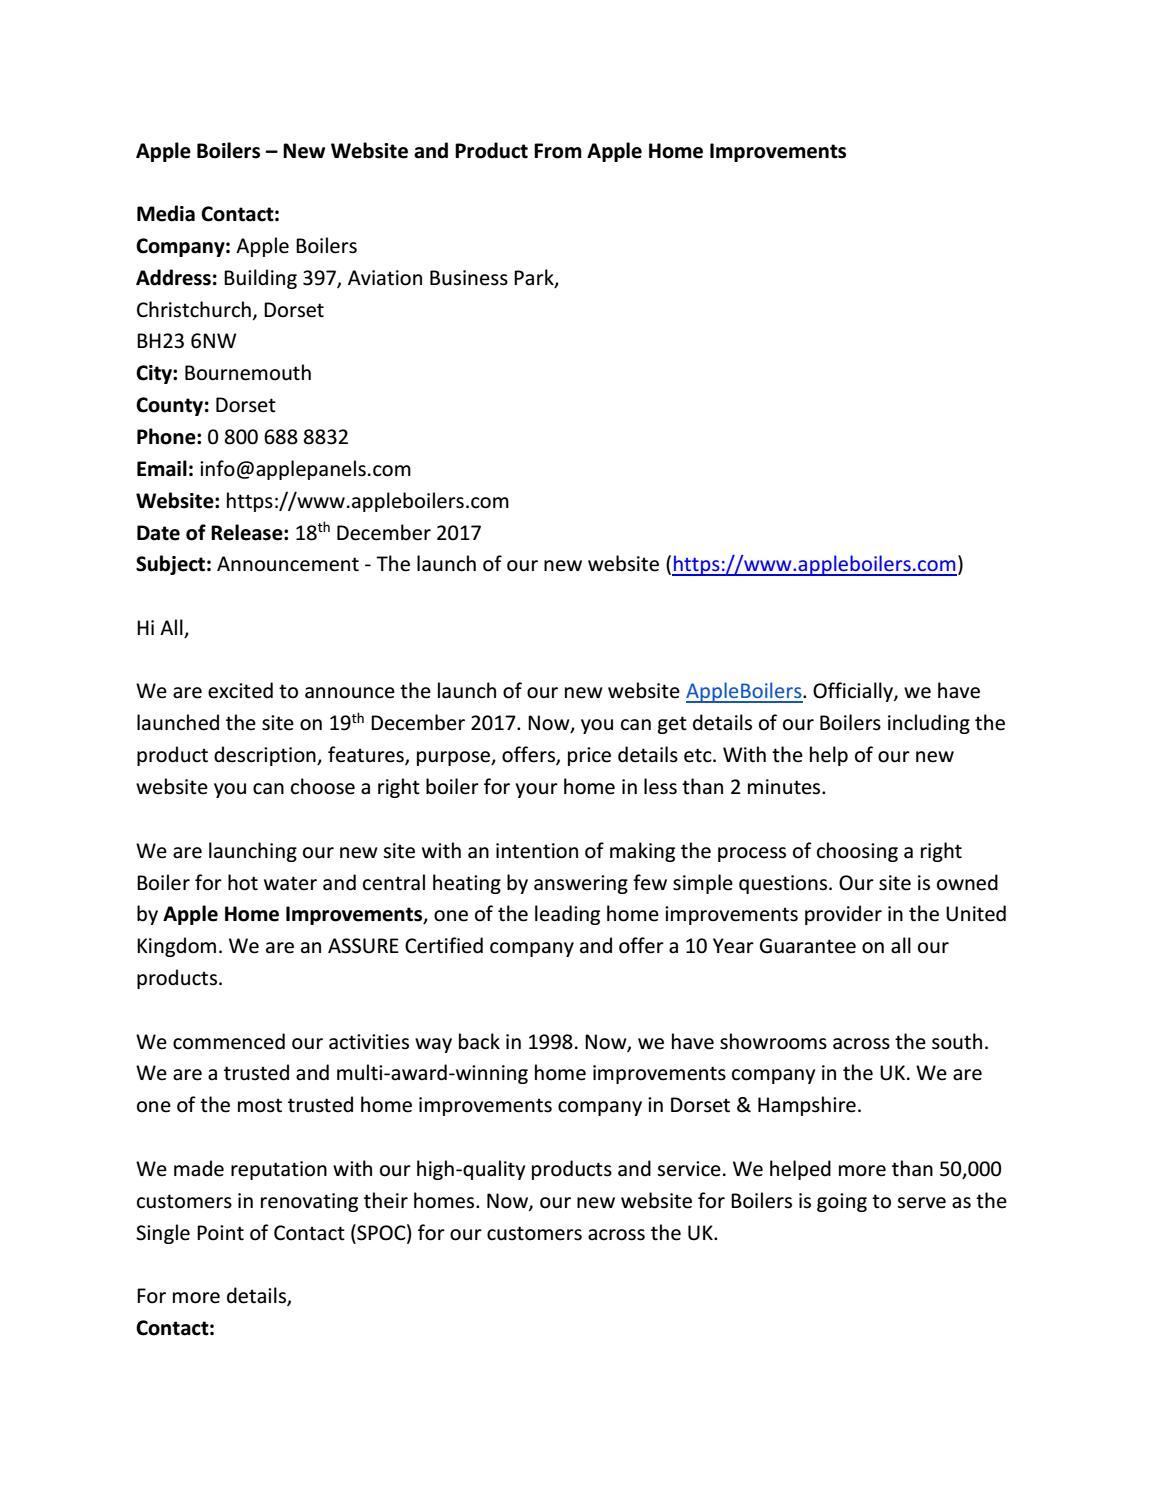 Press Release Of Apple Boilers By Info Appleboilers Issuu